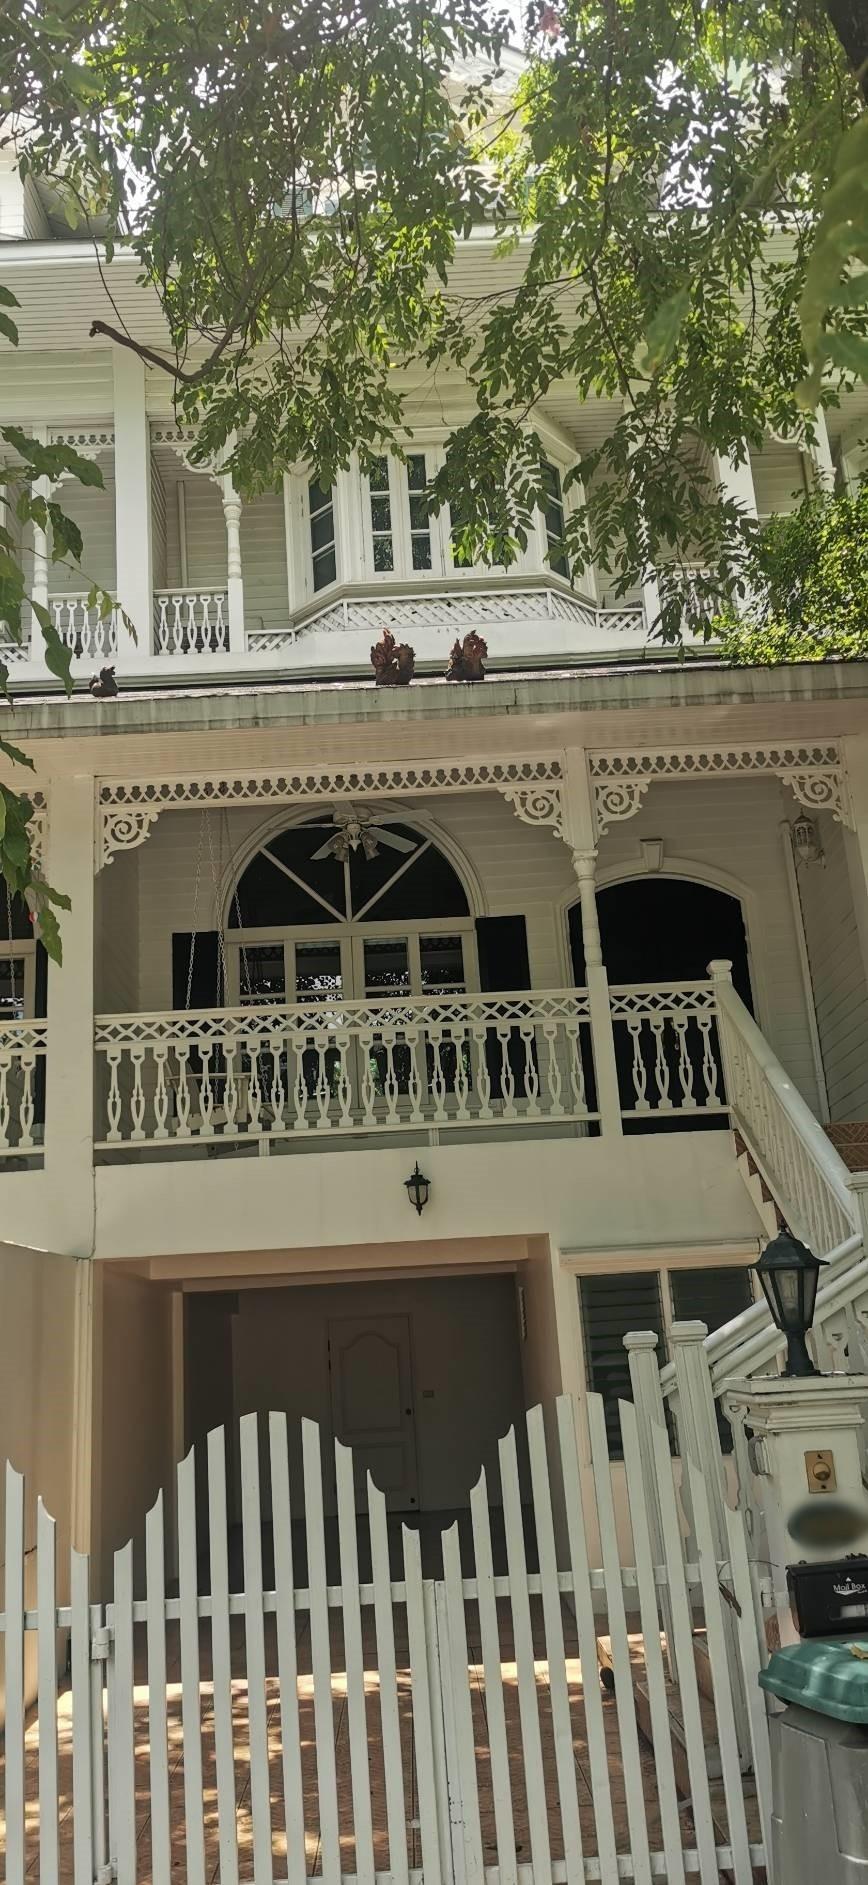 For Rent Single House Fantasia Villa2 4 beds at BTS Bearing (SPS-GH144)